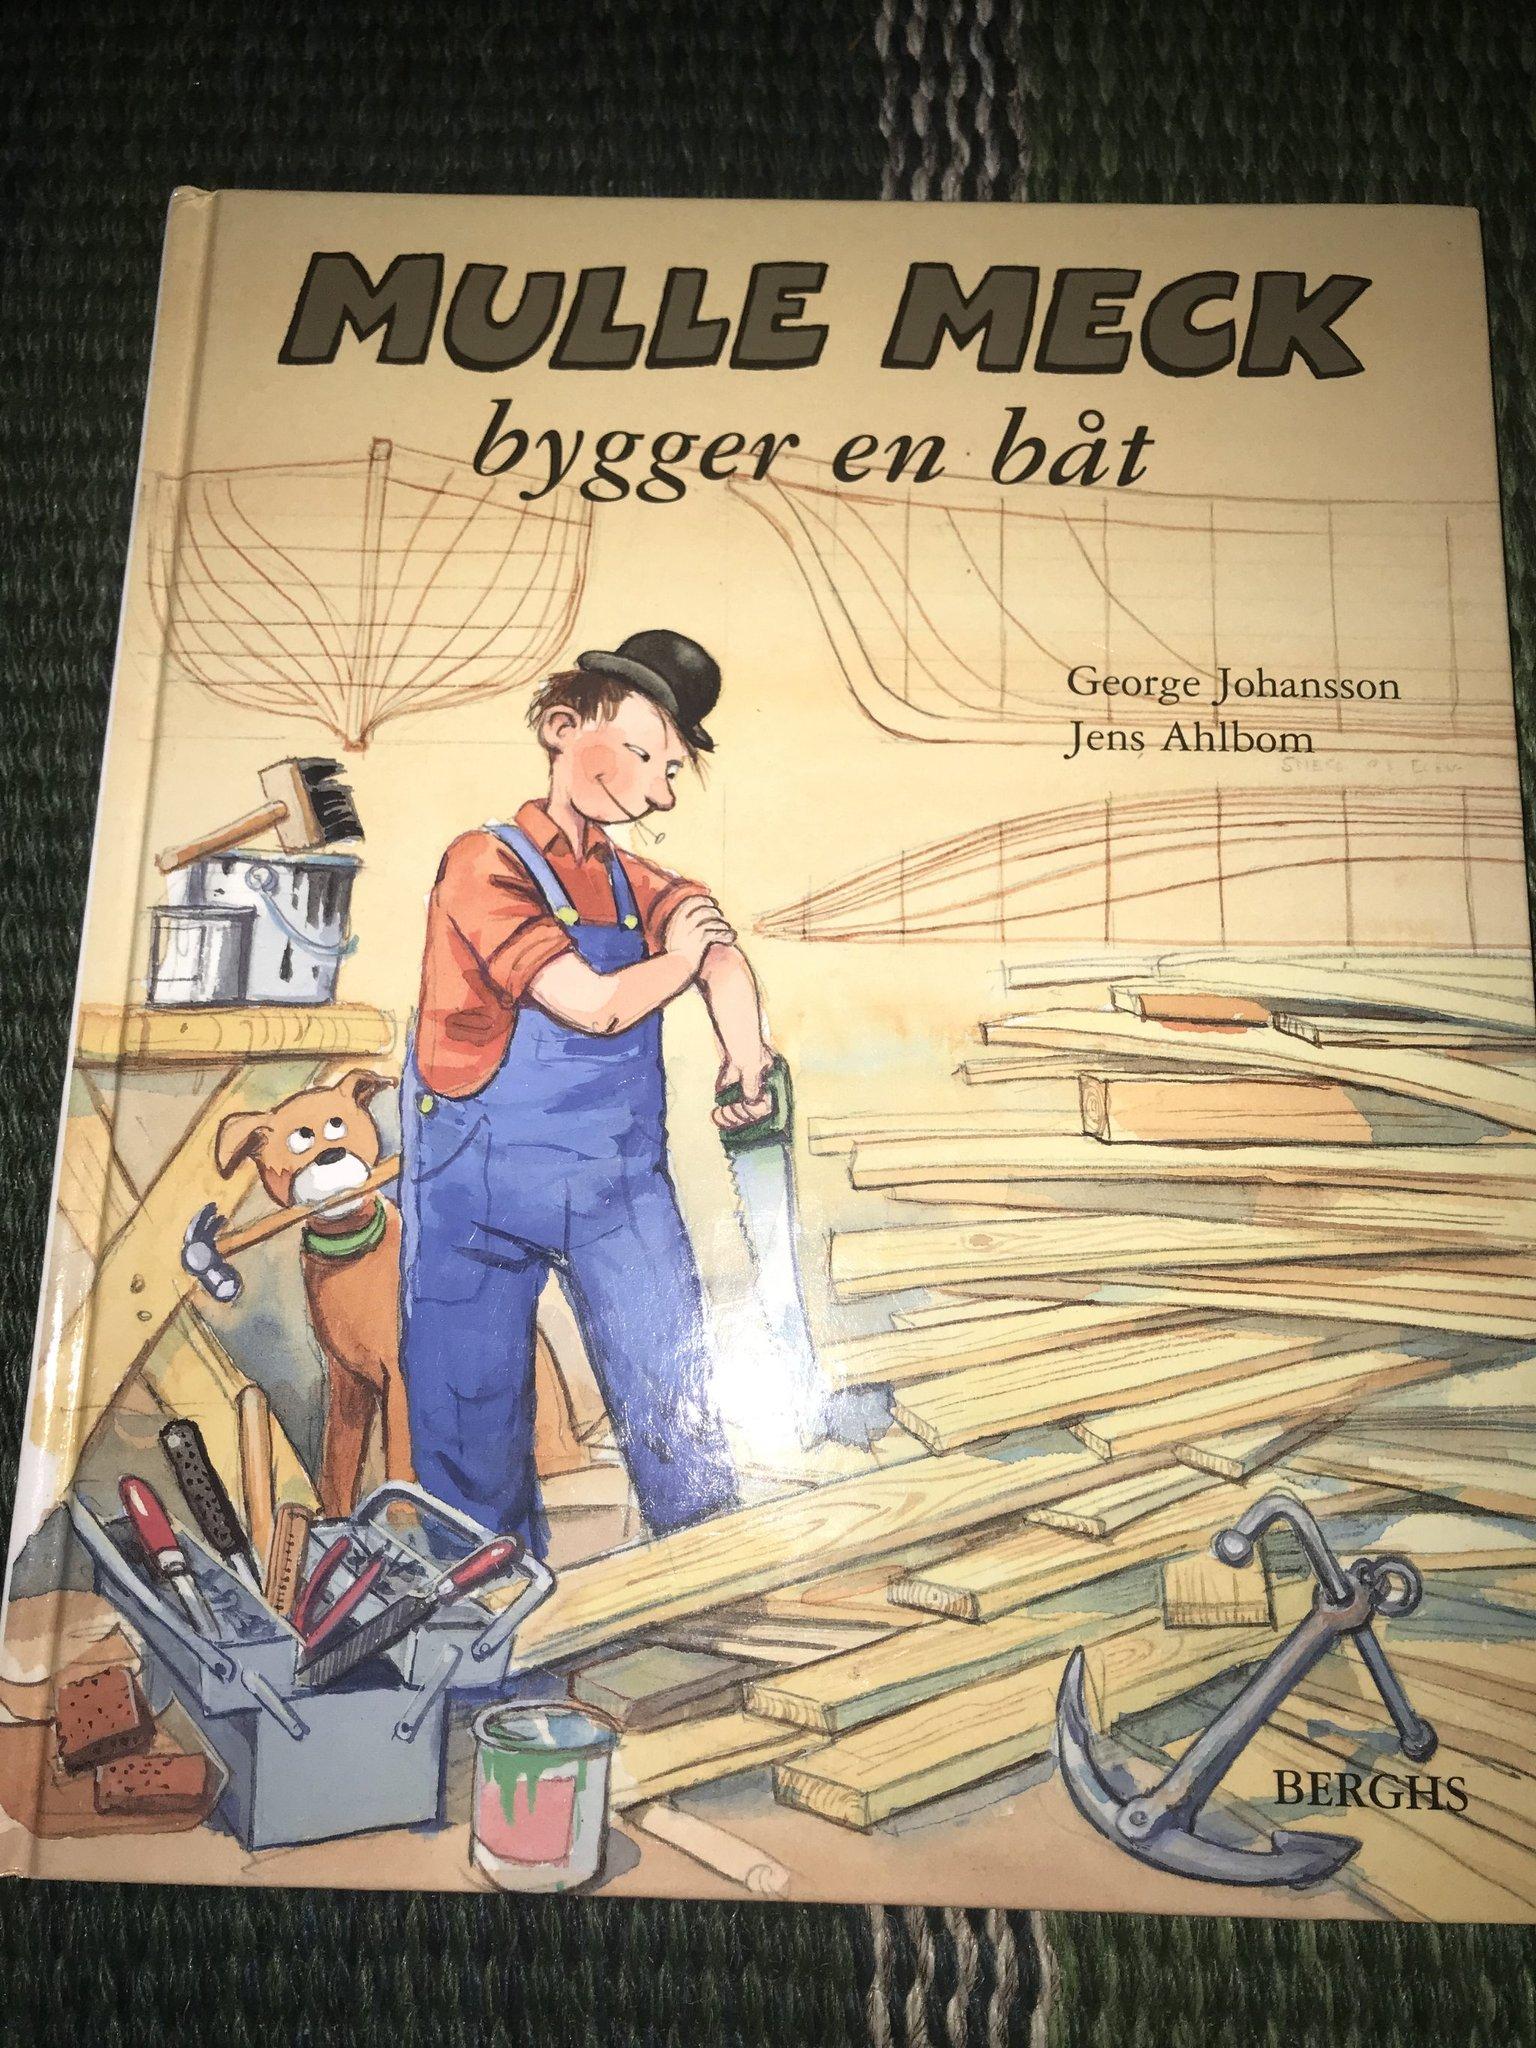 Mulle Meck Bygger En Bat George Johansson Ber 361196138